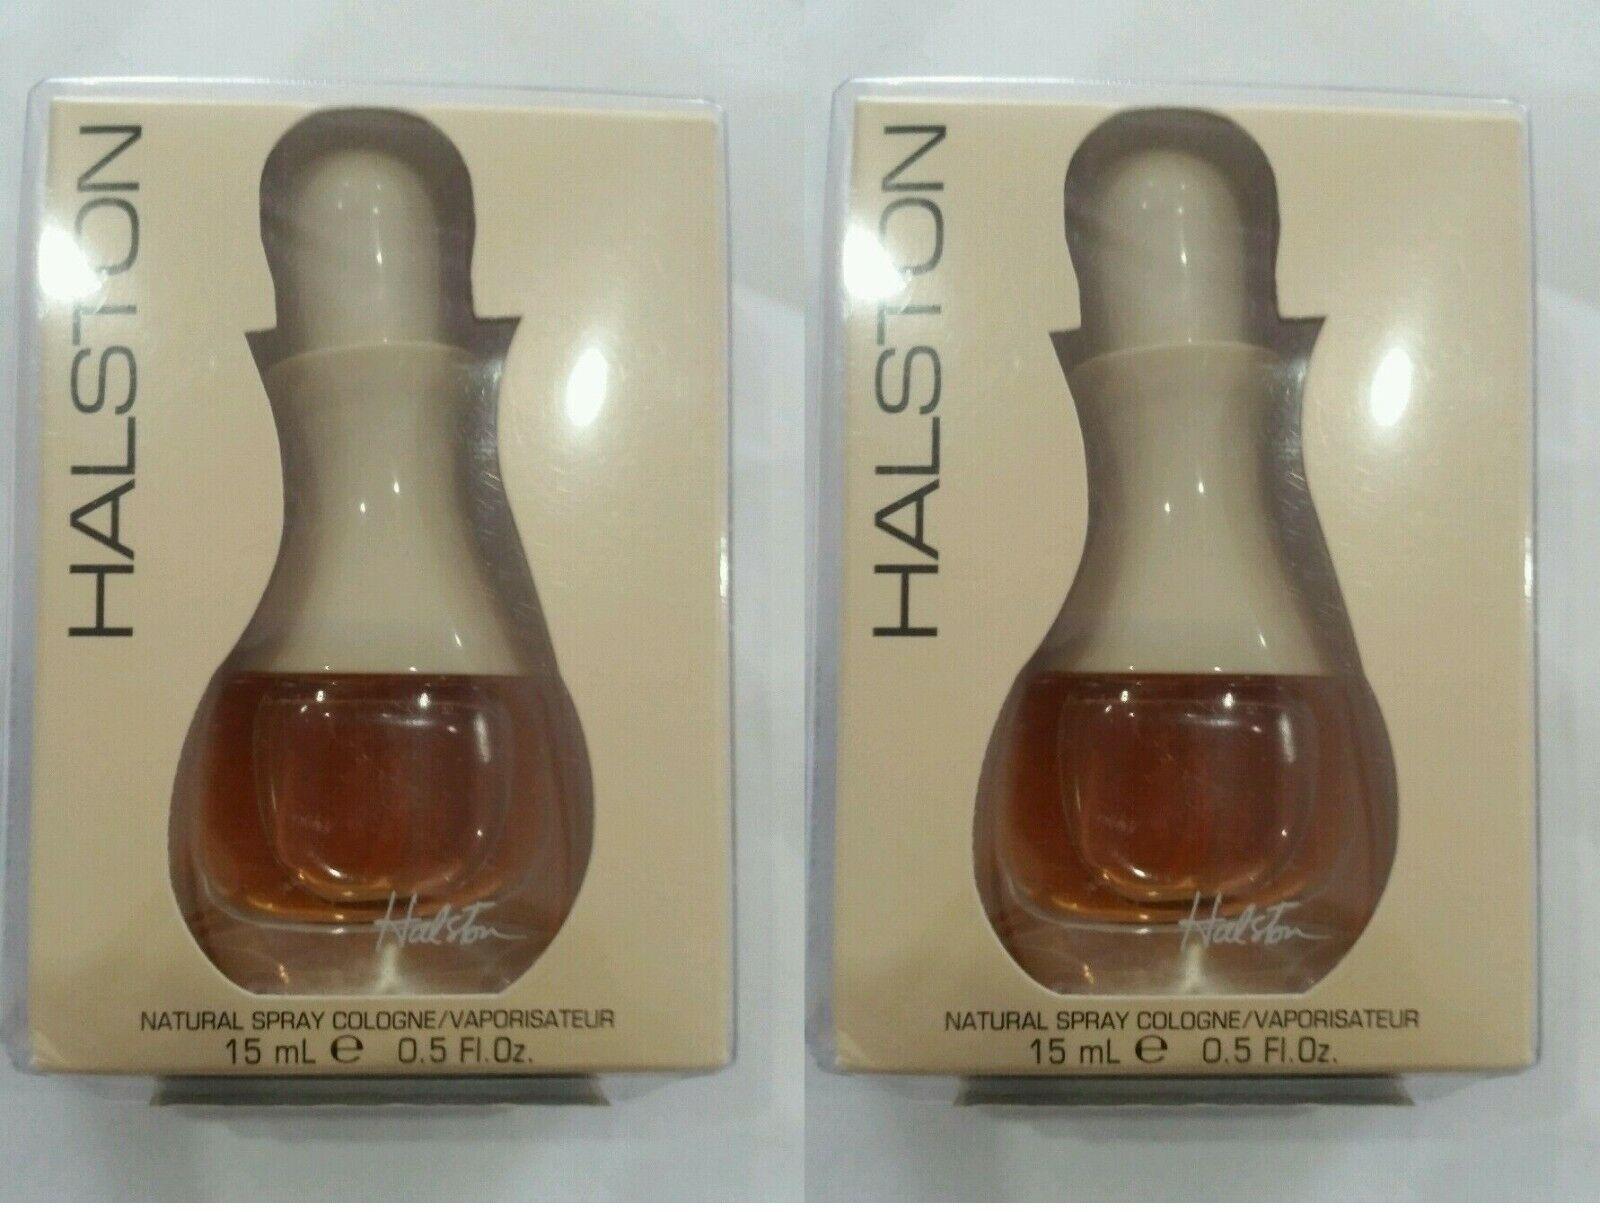 Halston Cologne Spray for Women Vaporisateur